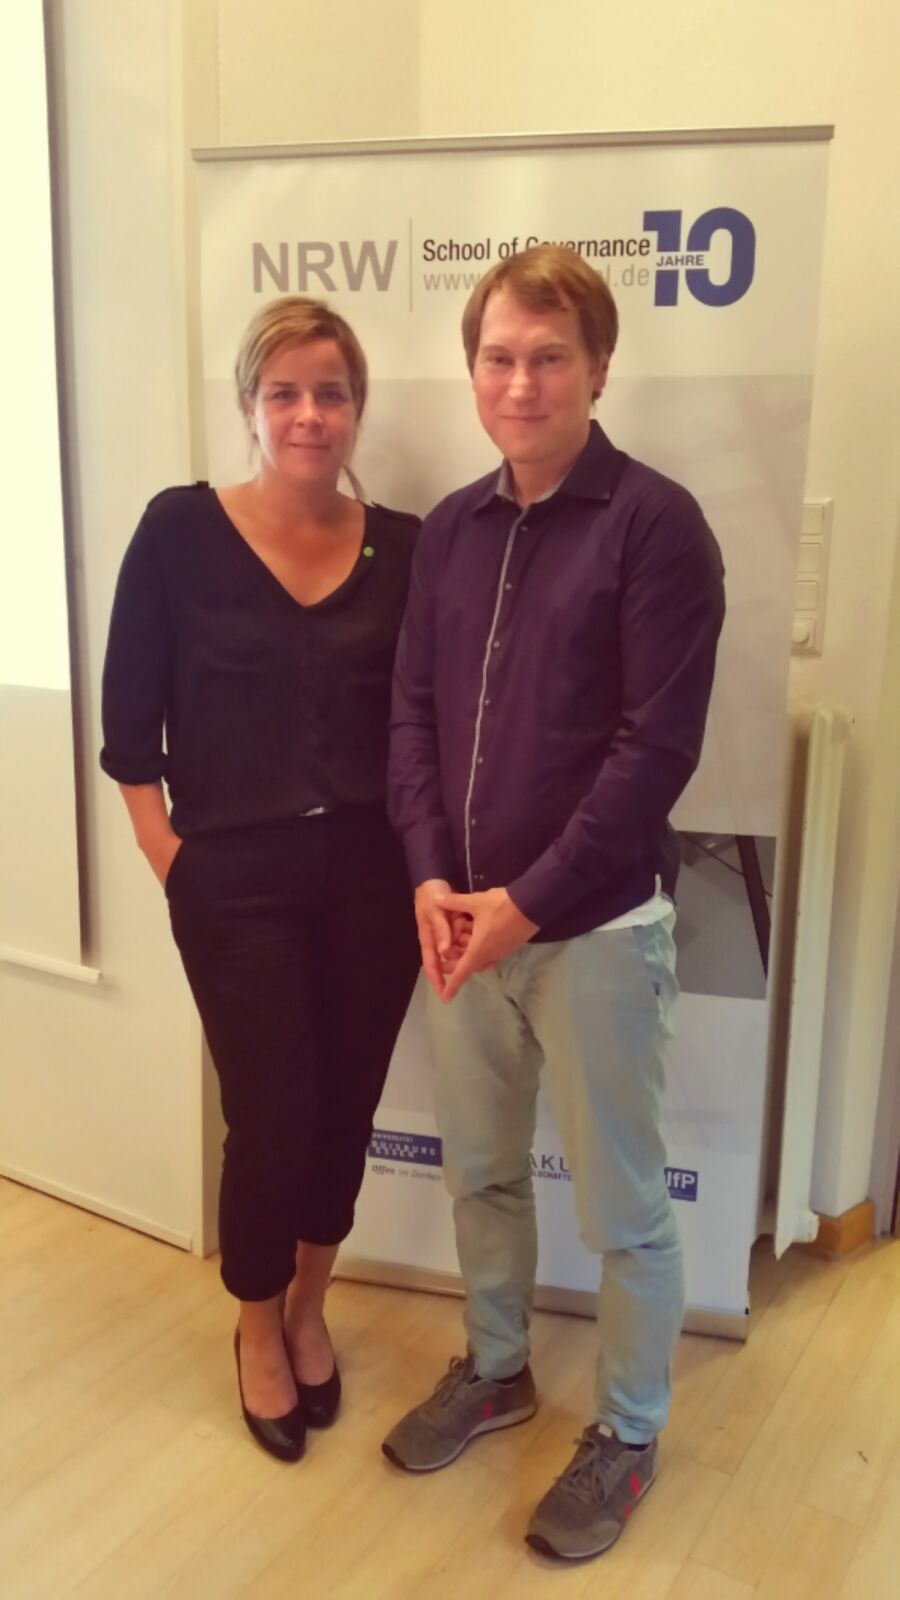 Mona Neubaur und Dr. Niko Switek